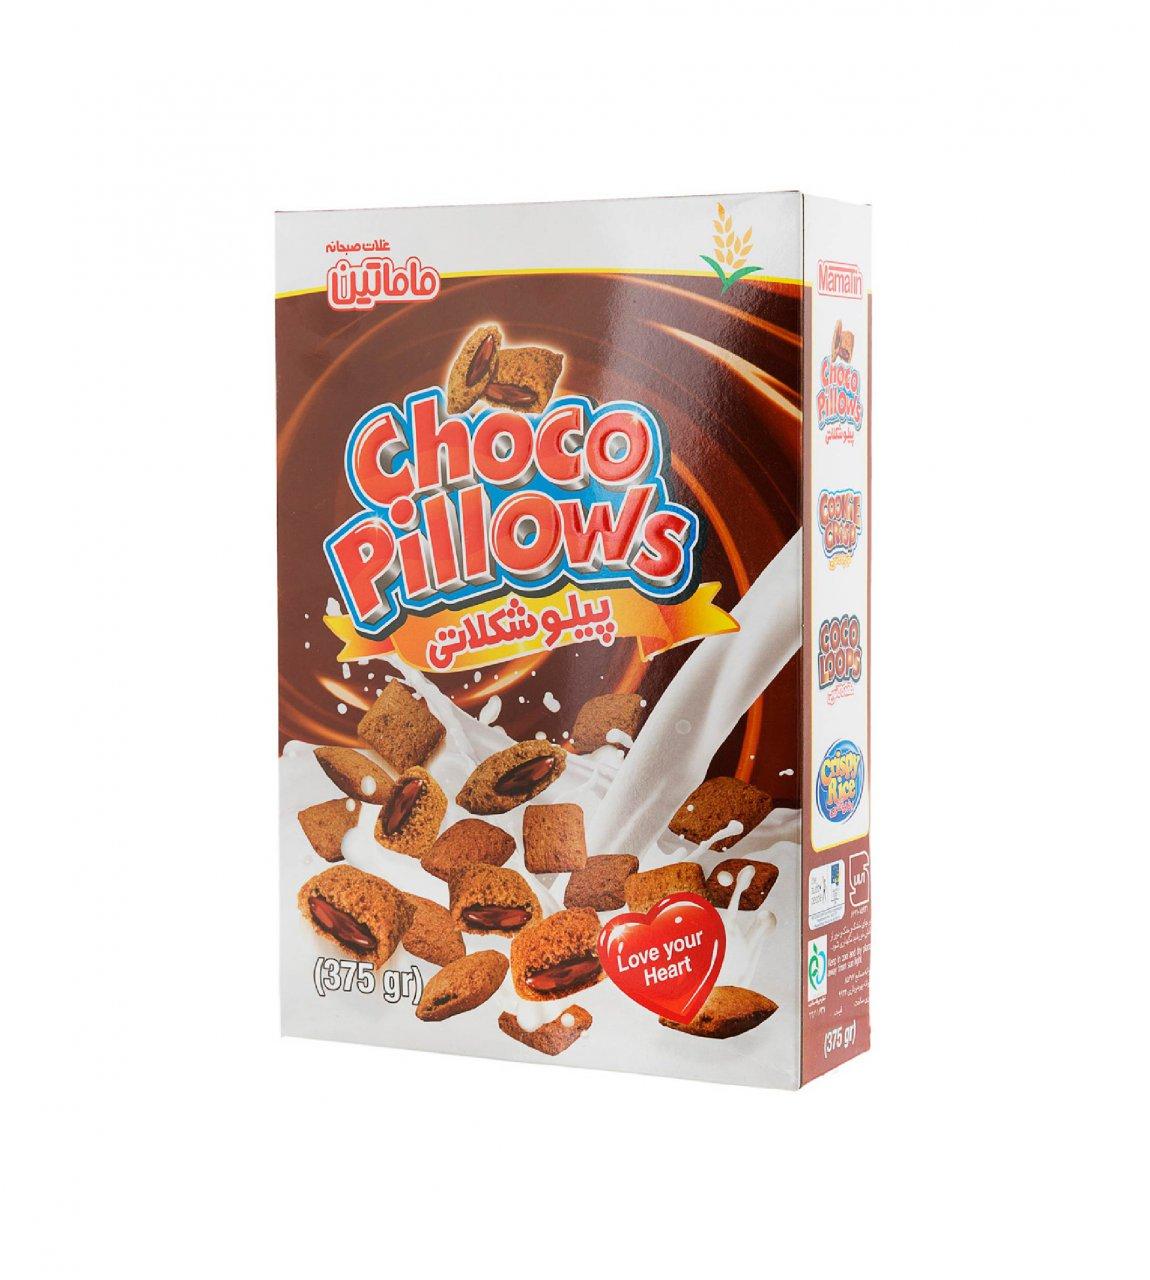 غلات صبحانه پیلو شکلاتی ماماتین 375 گرم